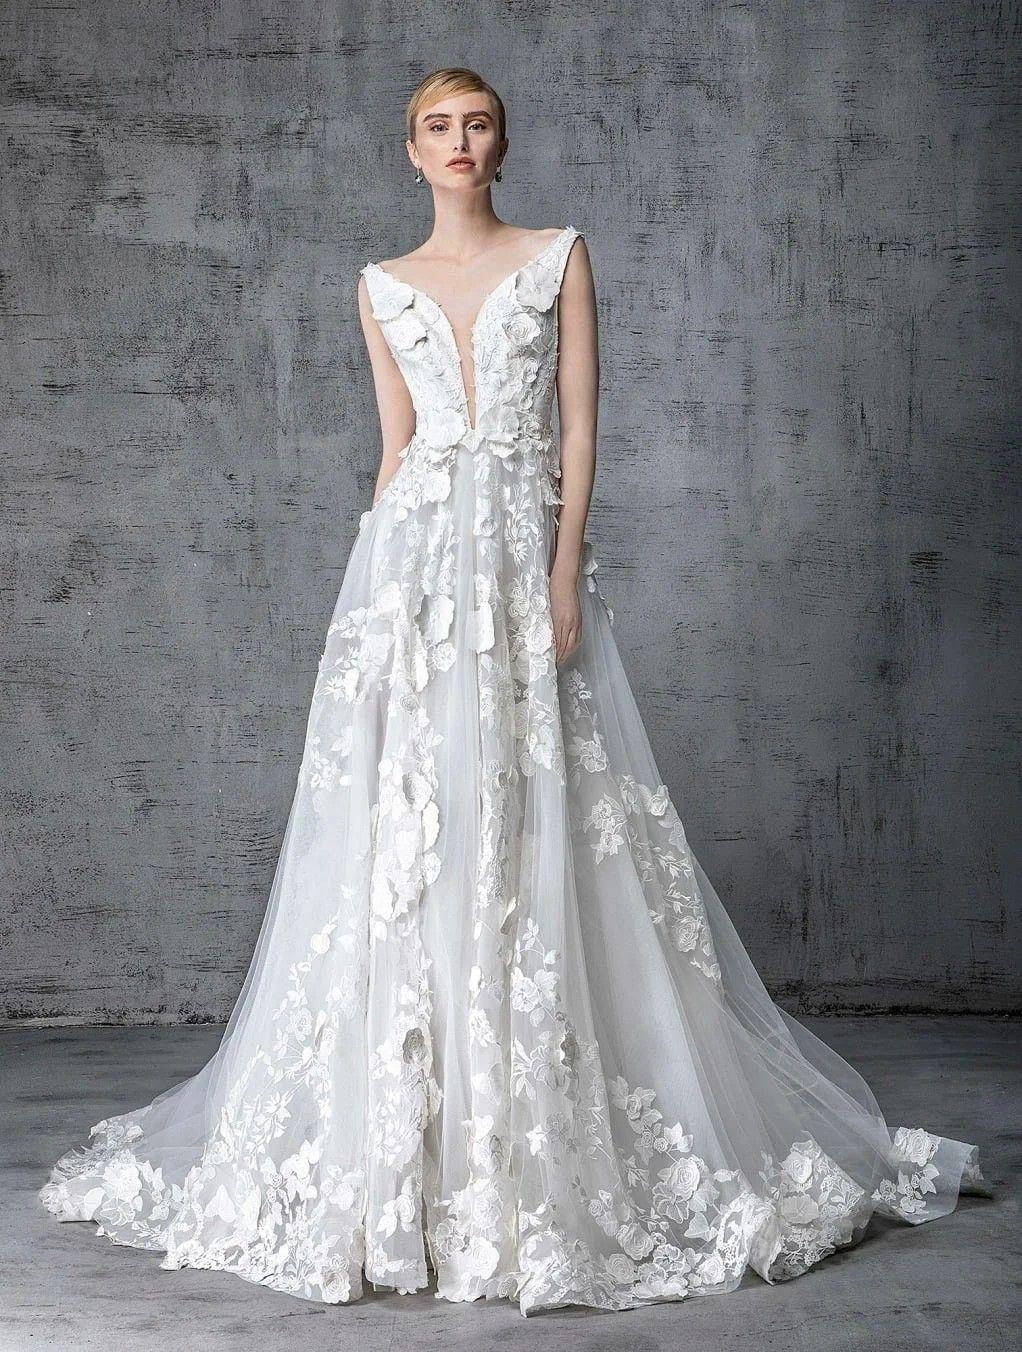 Pin by J Boule on Wedding Dress & Accessories | Pinterest | Wedding ...